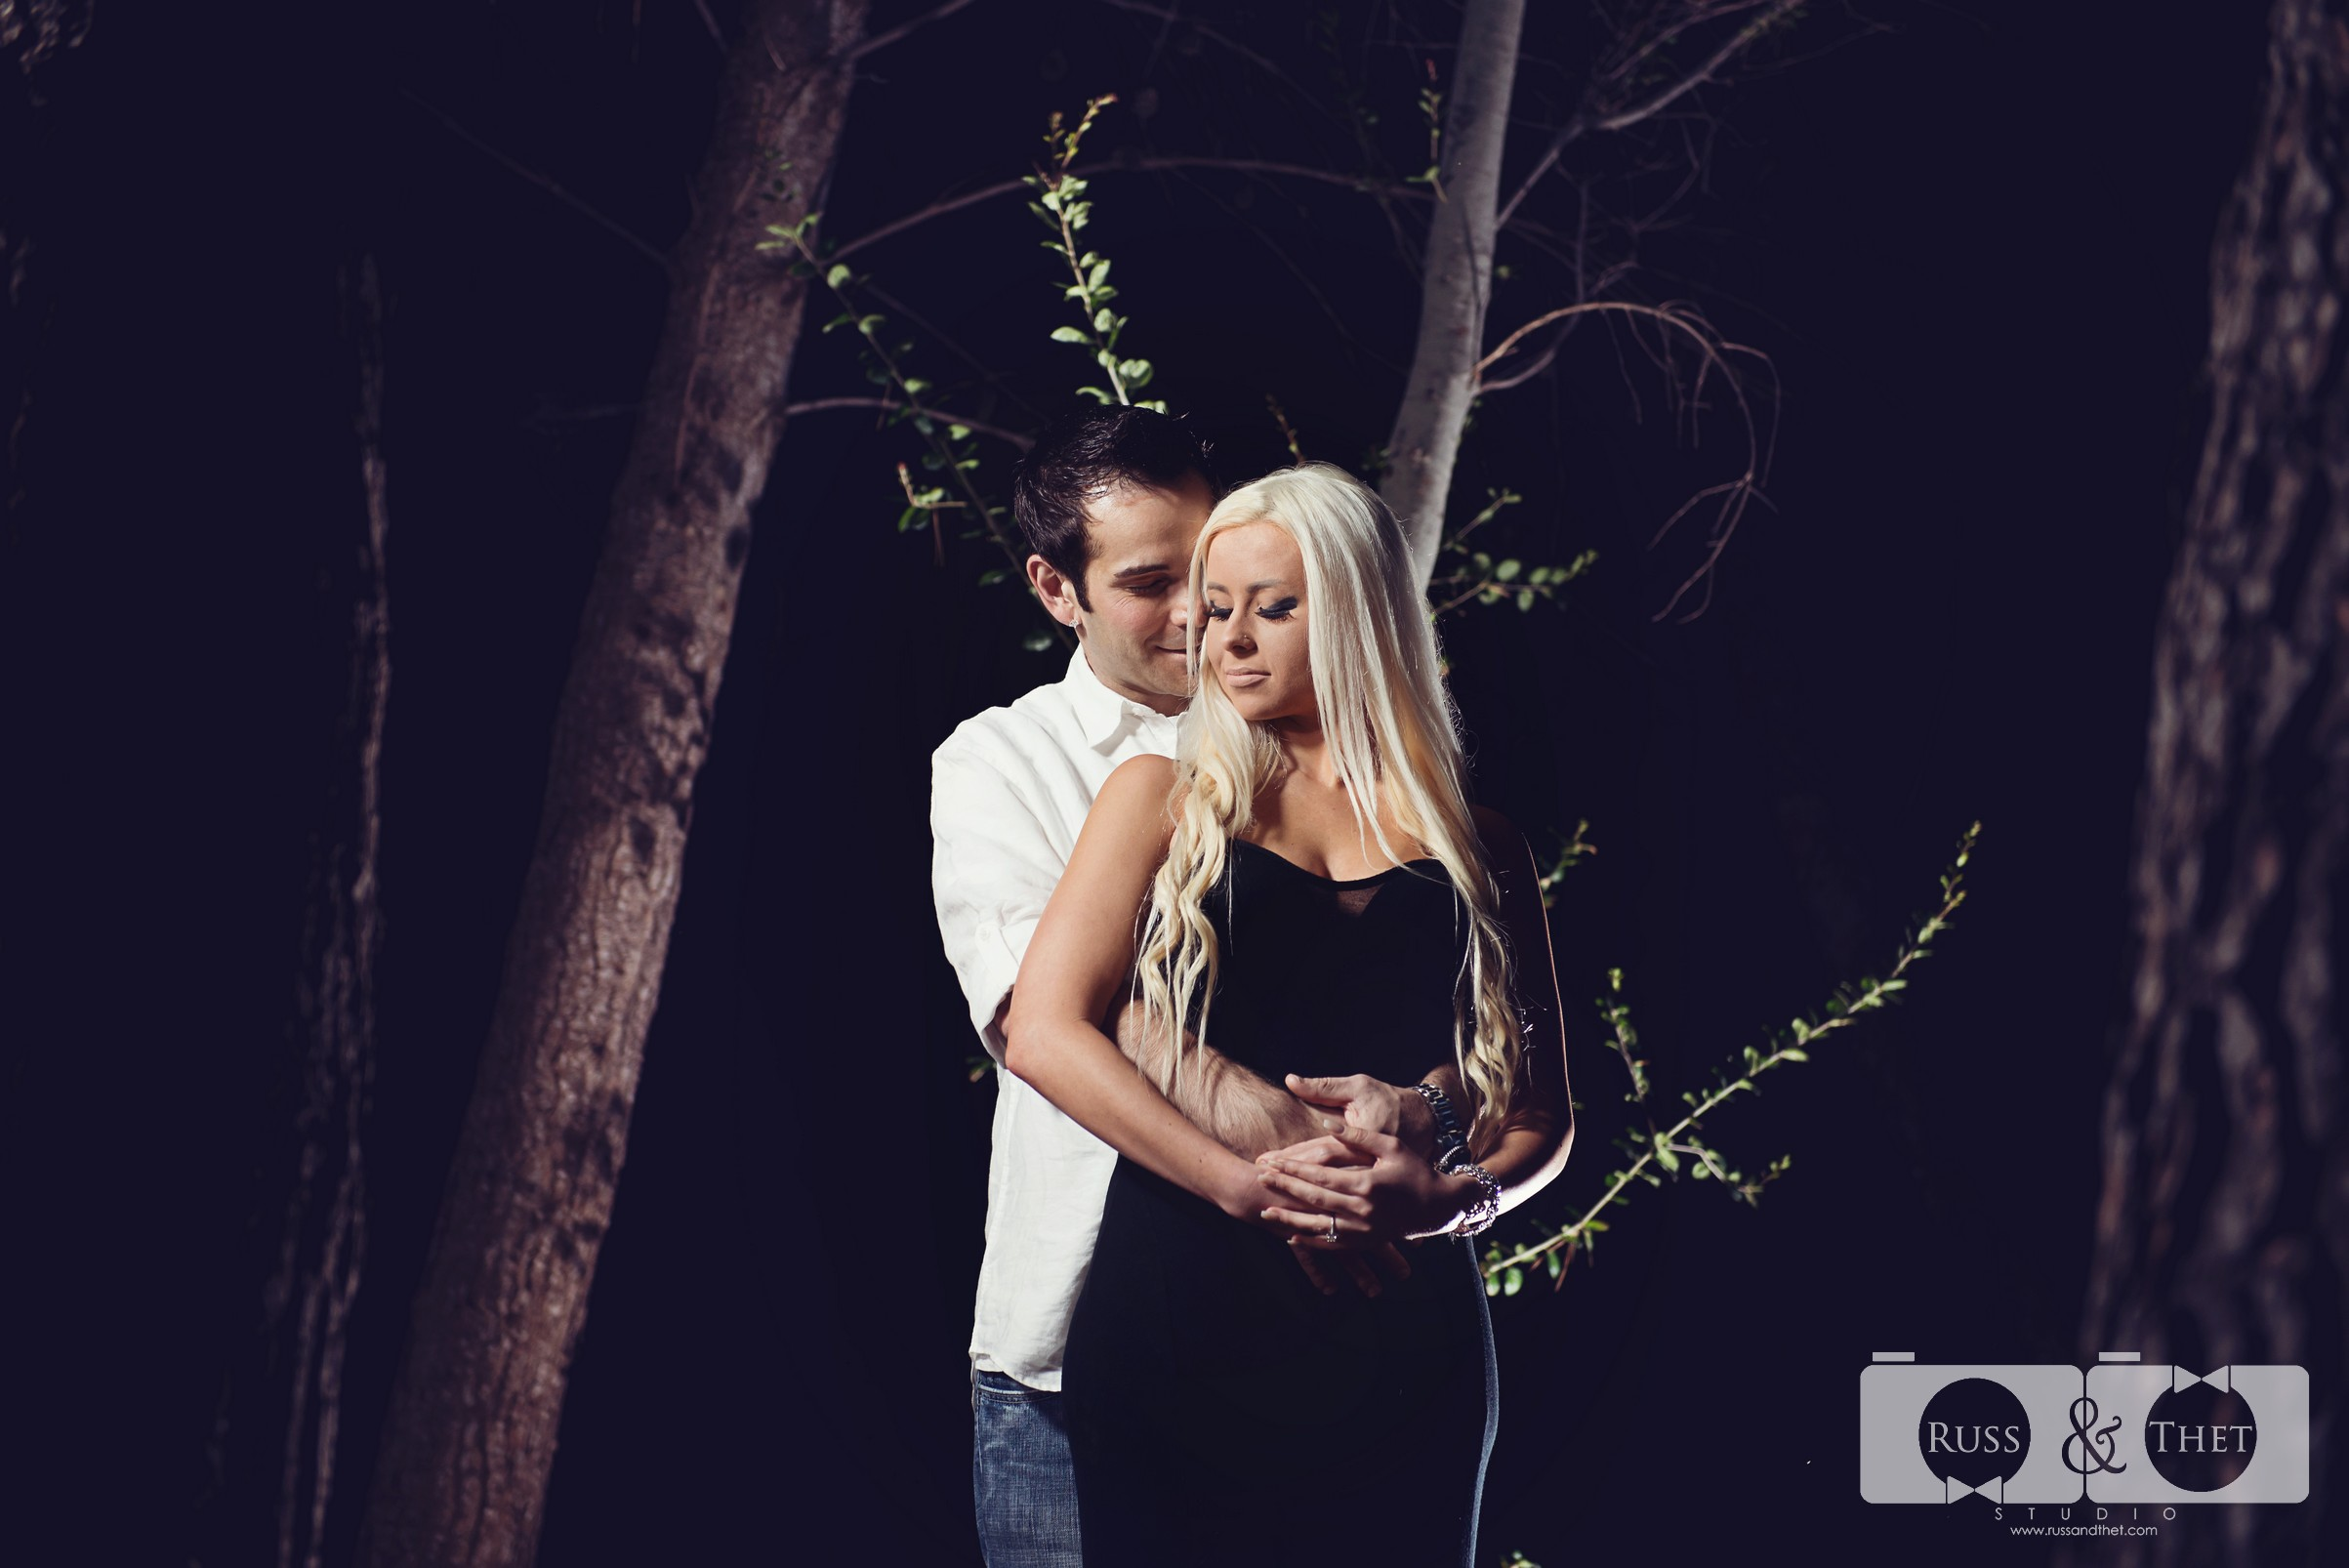 Jon&Kimee-Orange-County-Engagement-Photographer (18).jpg